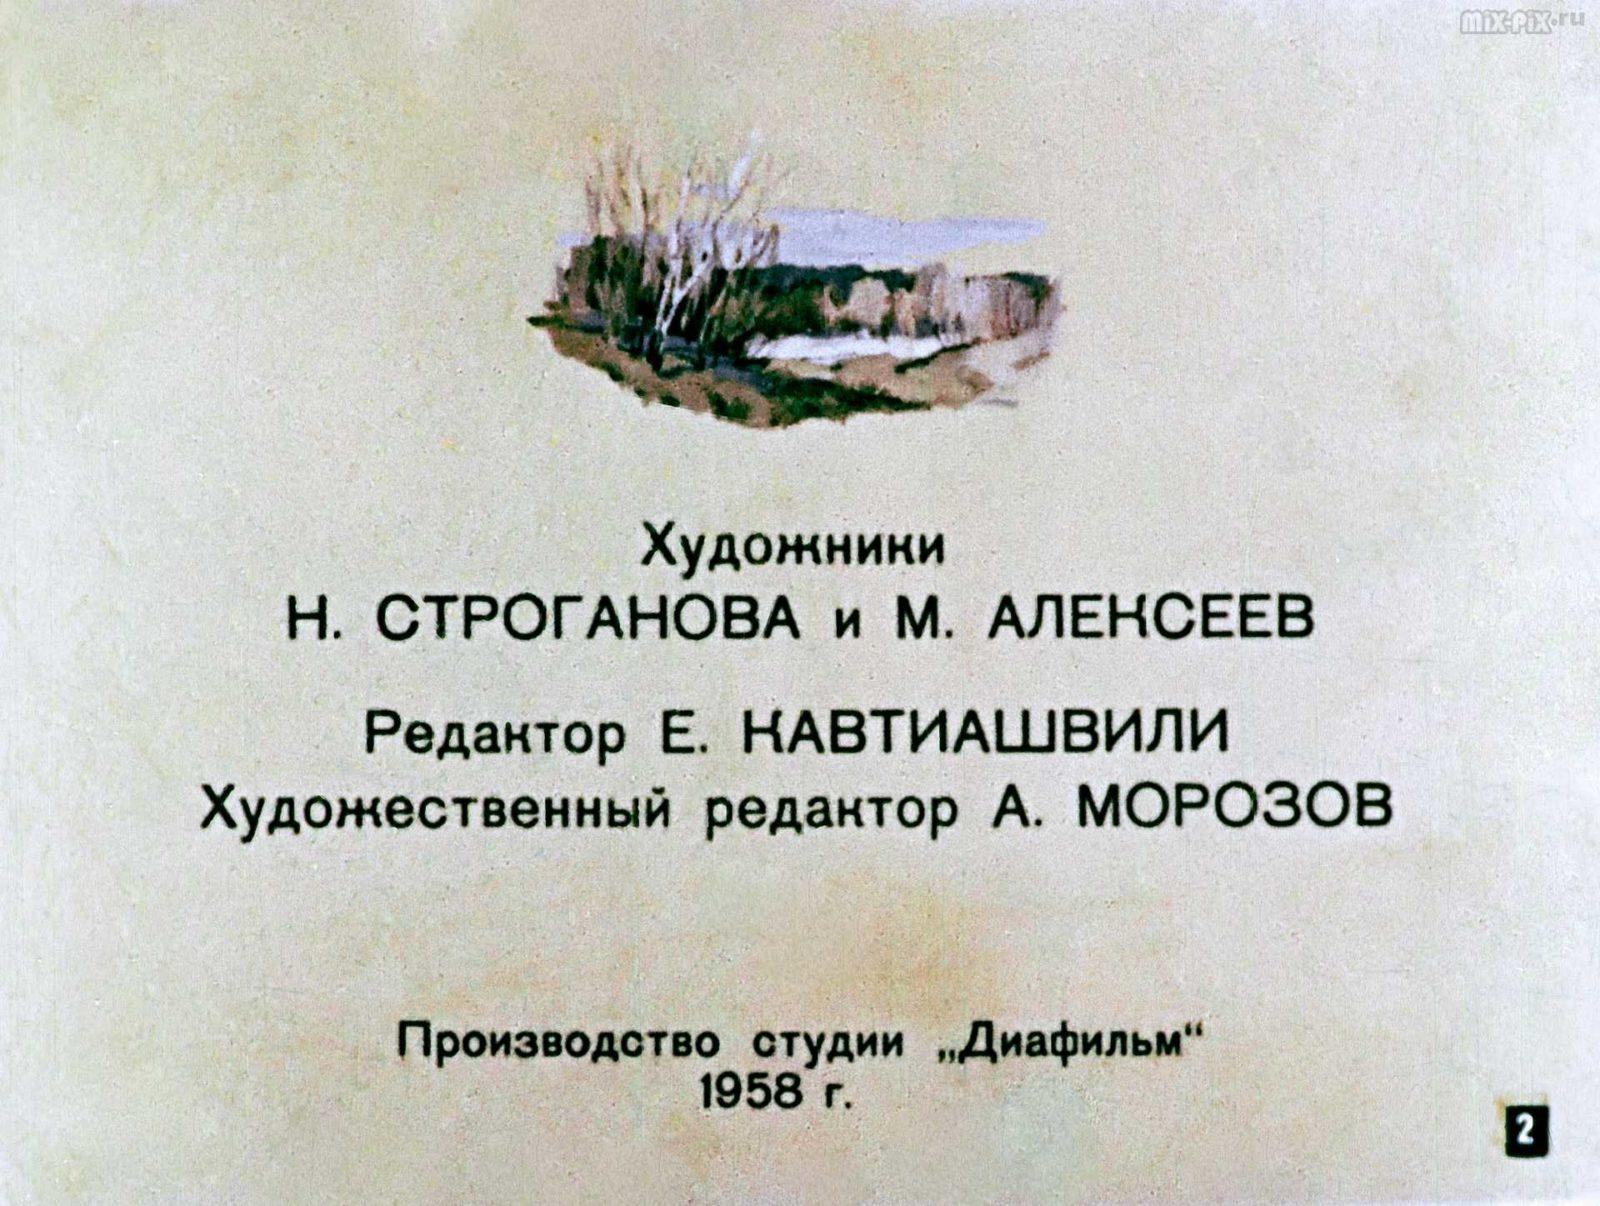 Зайкин год (1958) 31